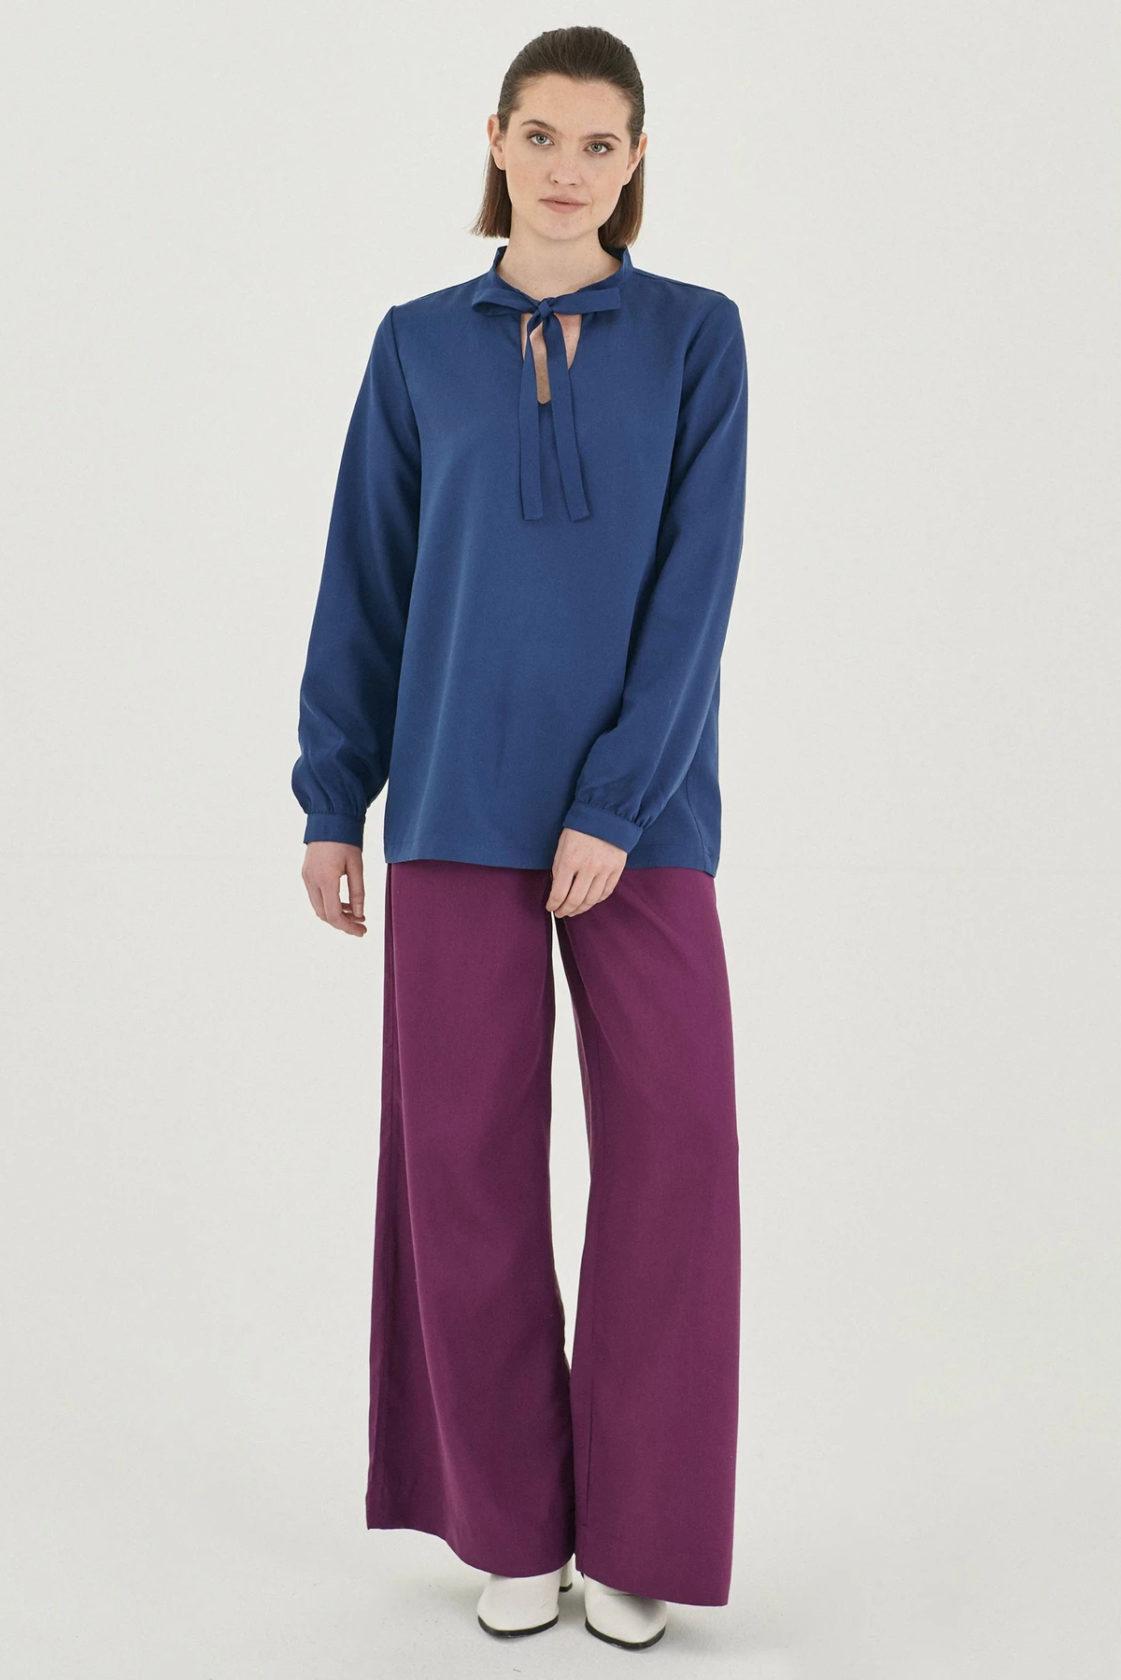 Roberta Organic Fashion Organication Bluse Blau 4